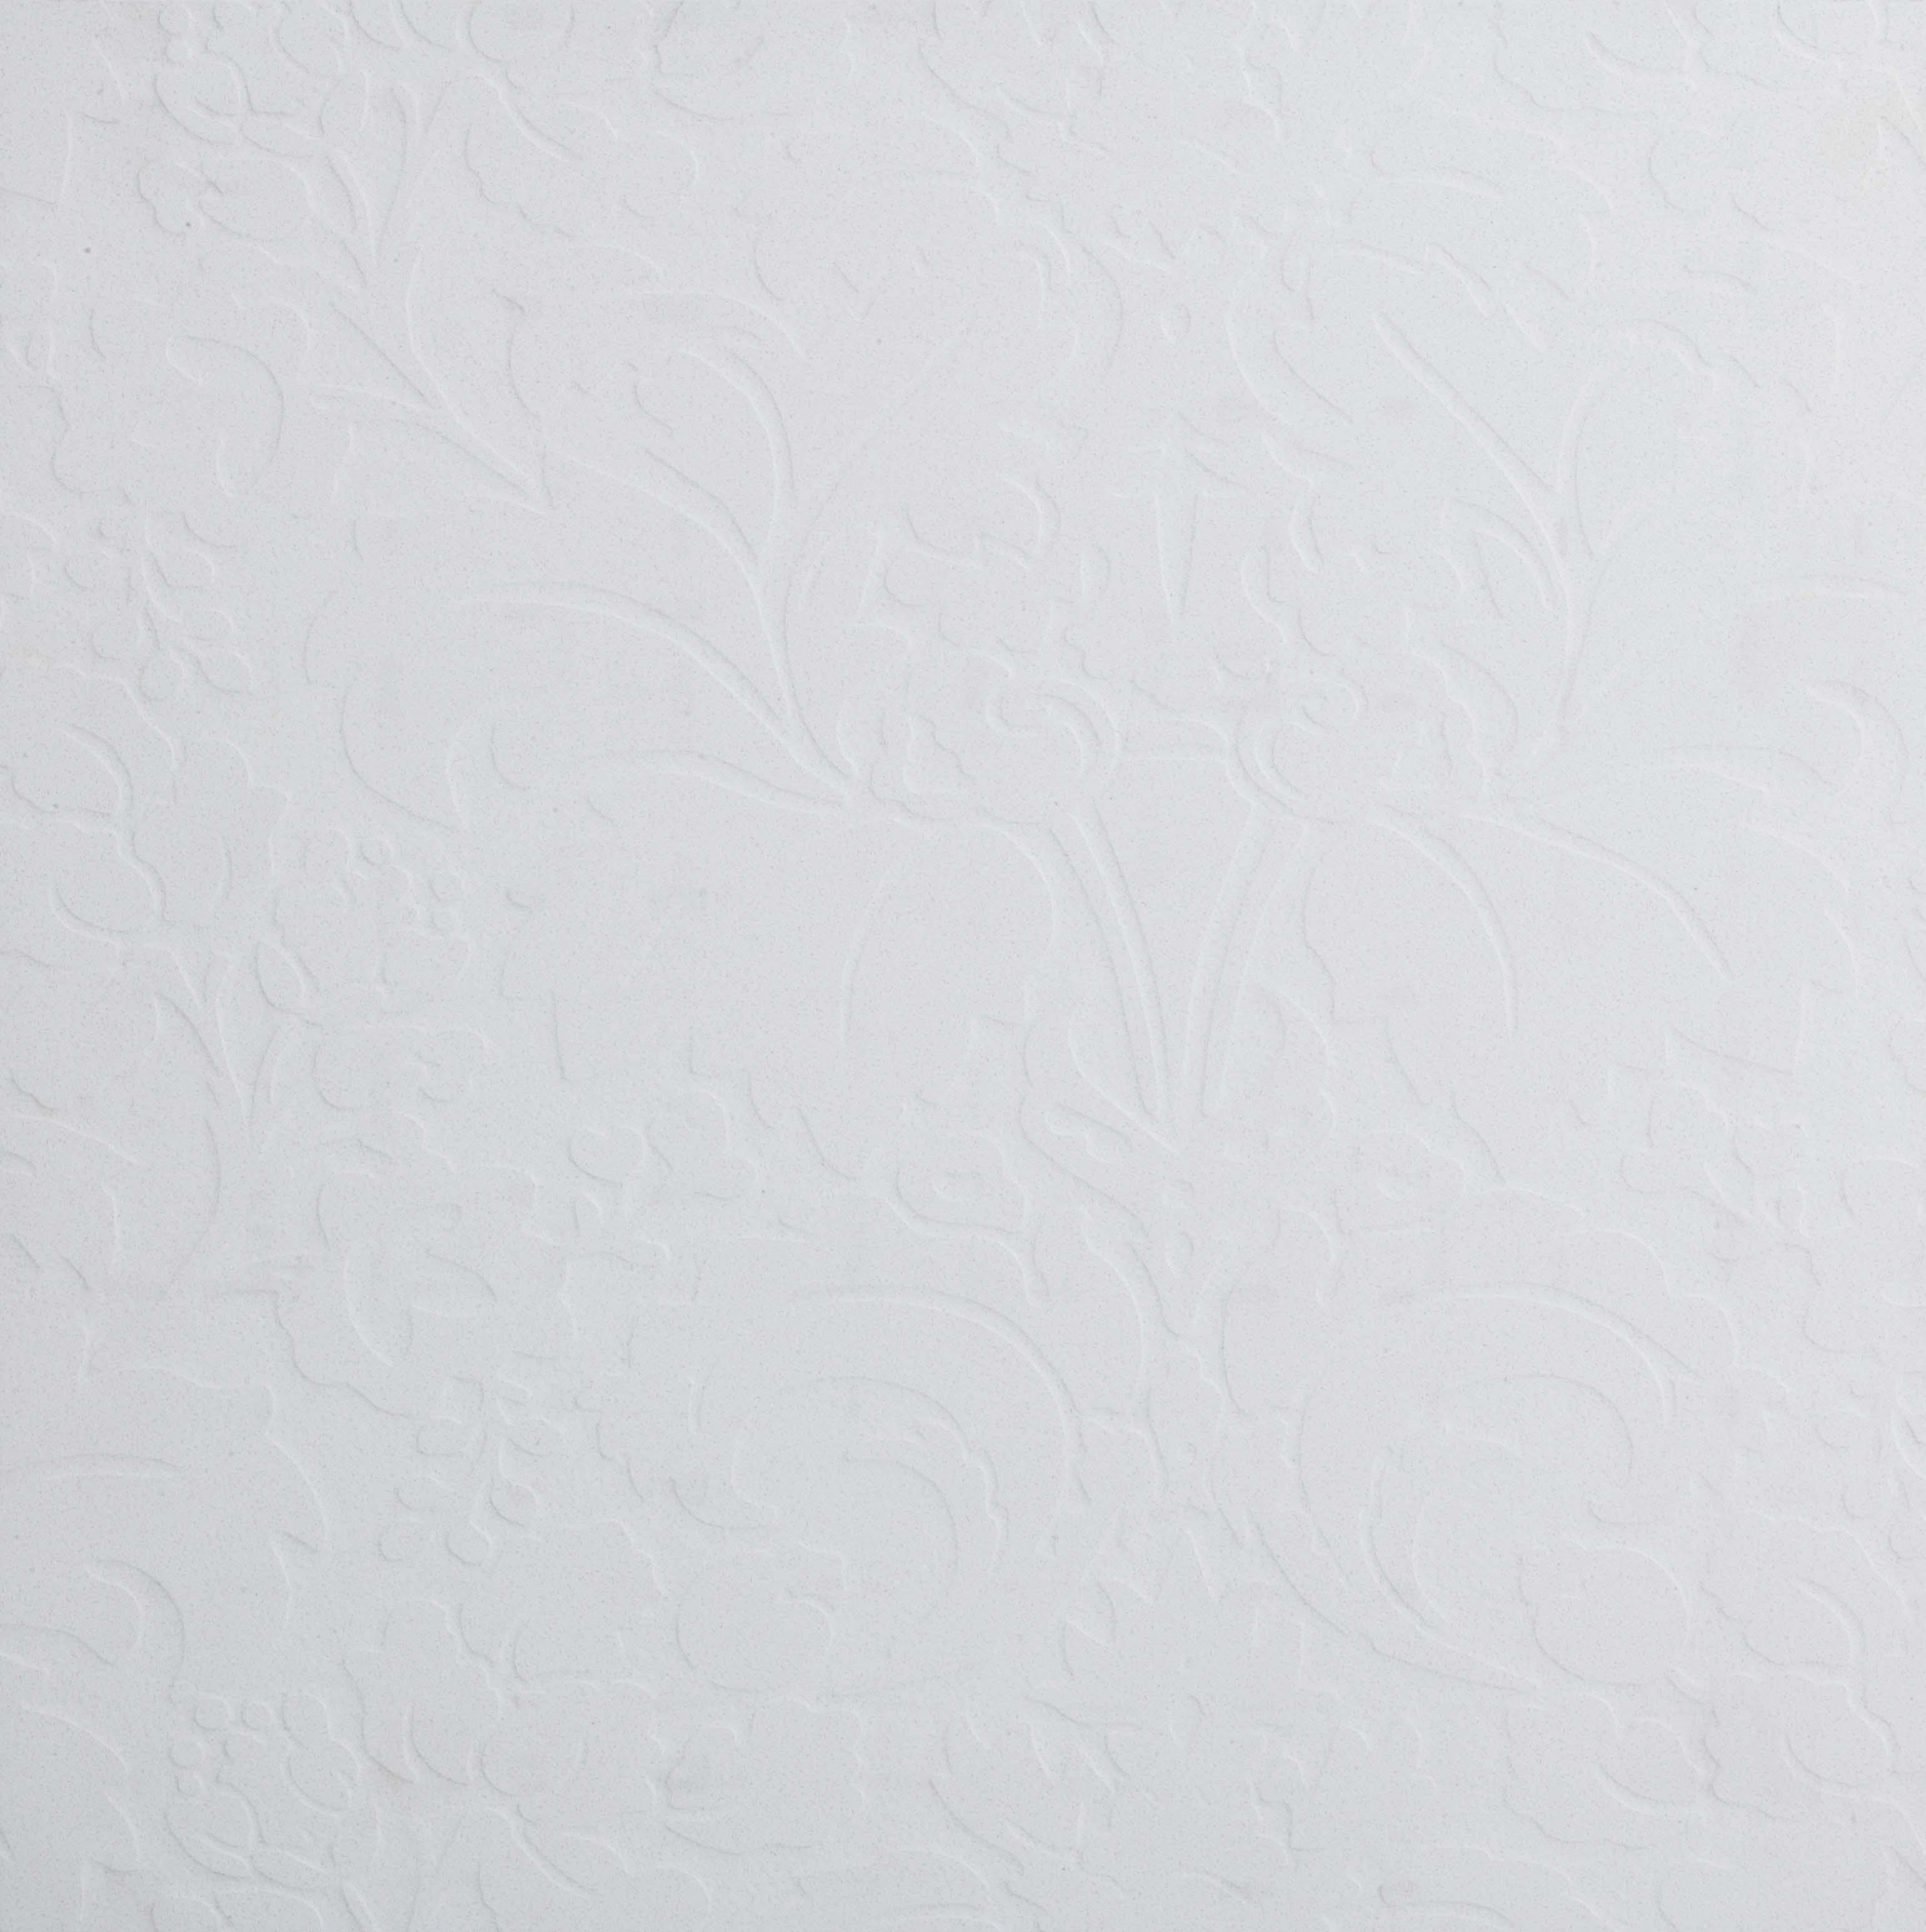 2141-Lace - Treppenanlagen zum Pauschalpreis